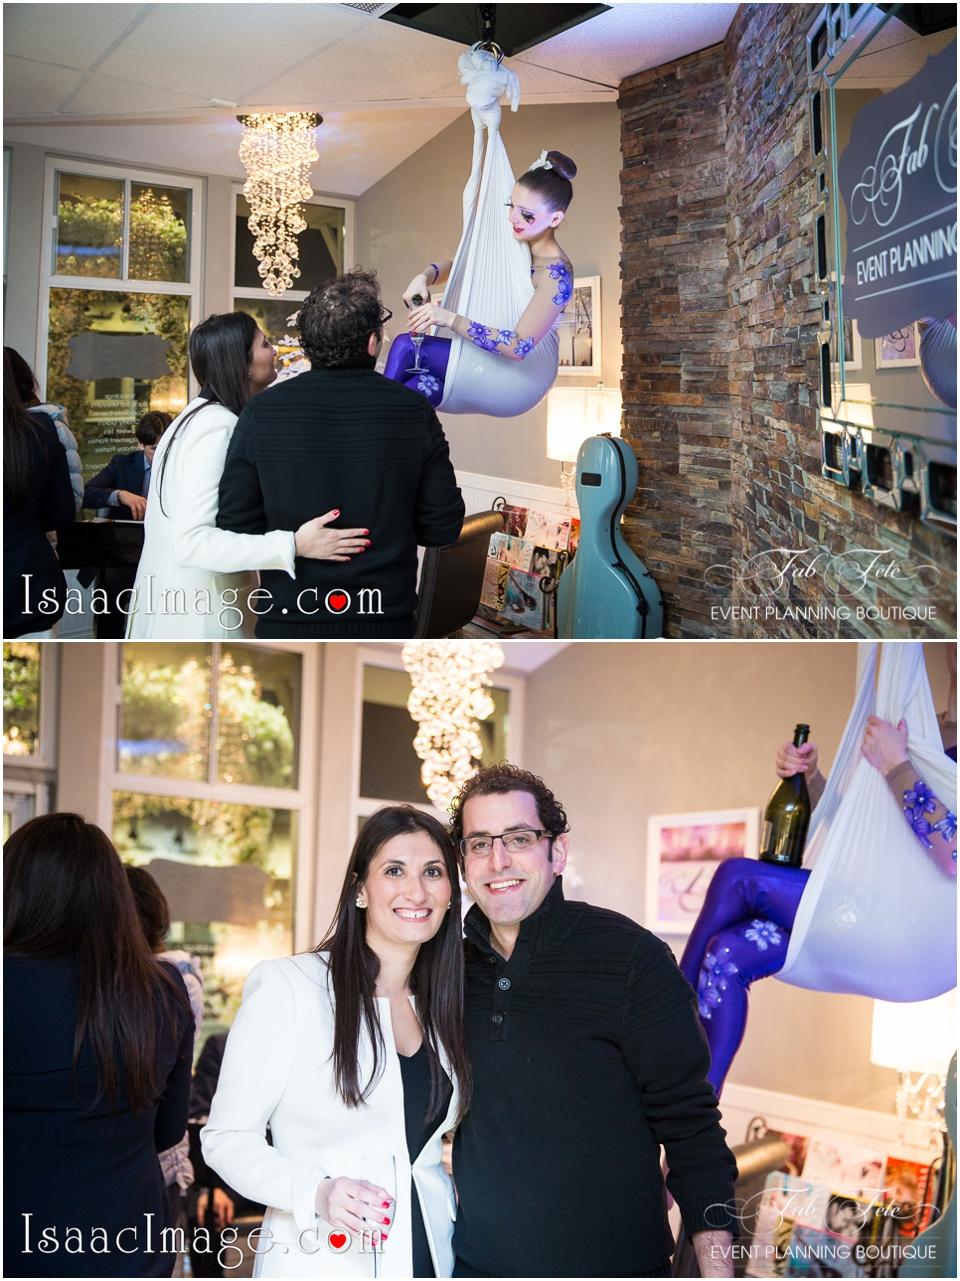 Fab Fete Toronto Wedding Event Planning Boutique open house_6492.jpg